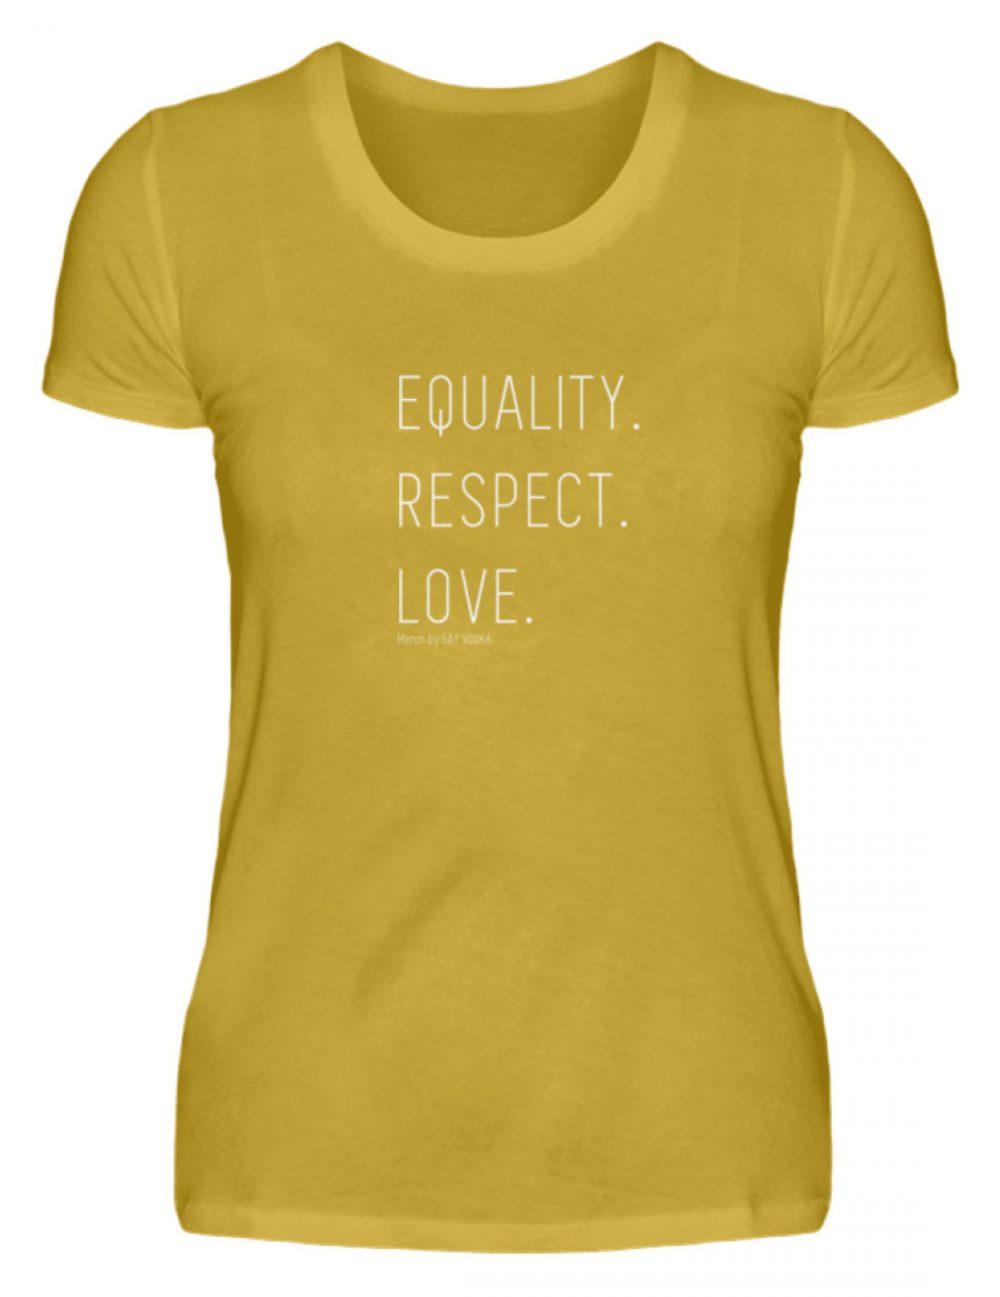 EQUALITY. RESPECT. LOVE. - Damen Premiumshirt-2980